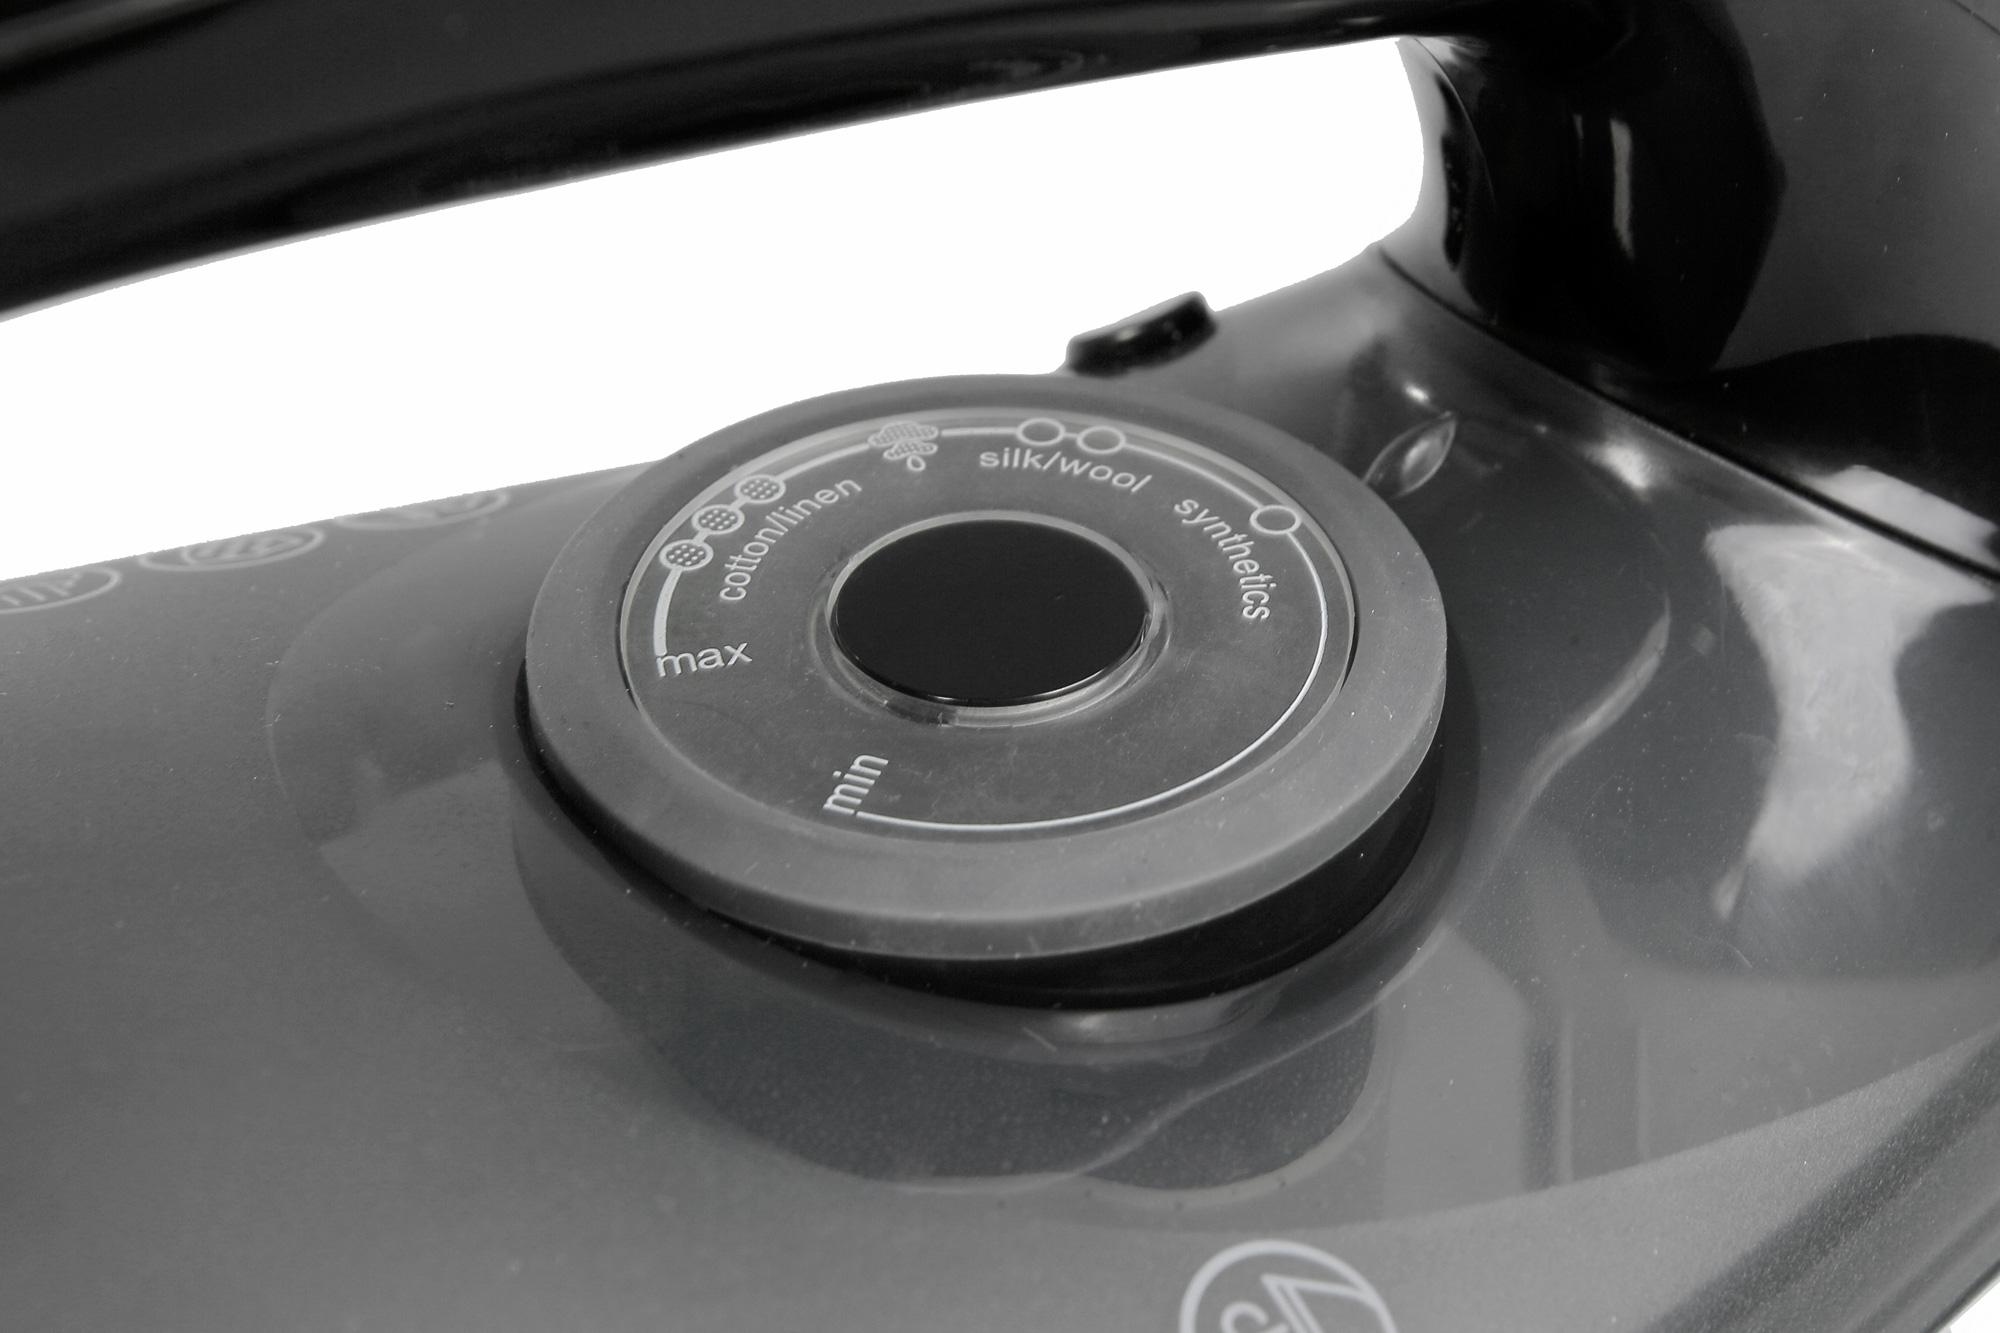 Stc-1000 терморегулятор инструкция на русском